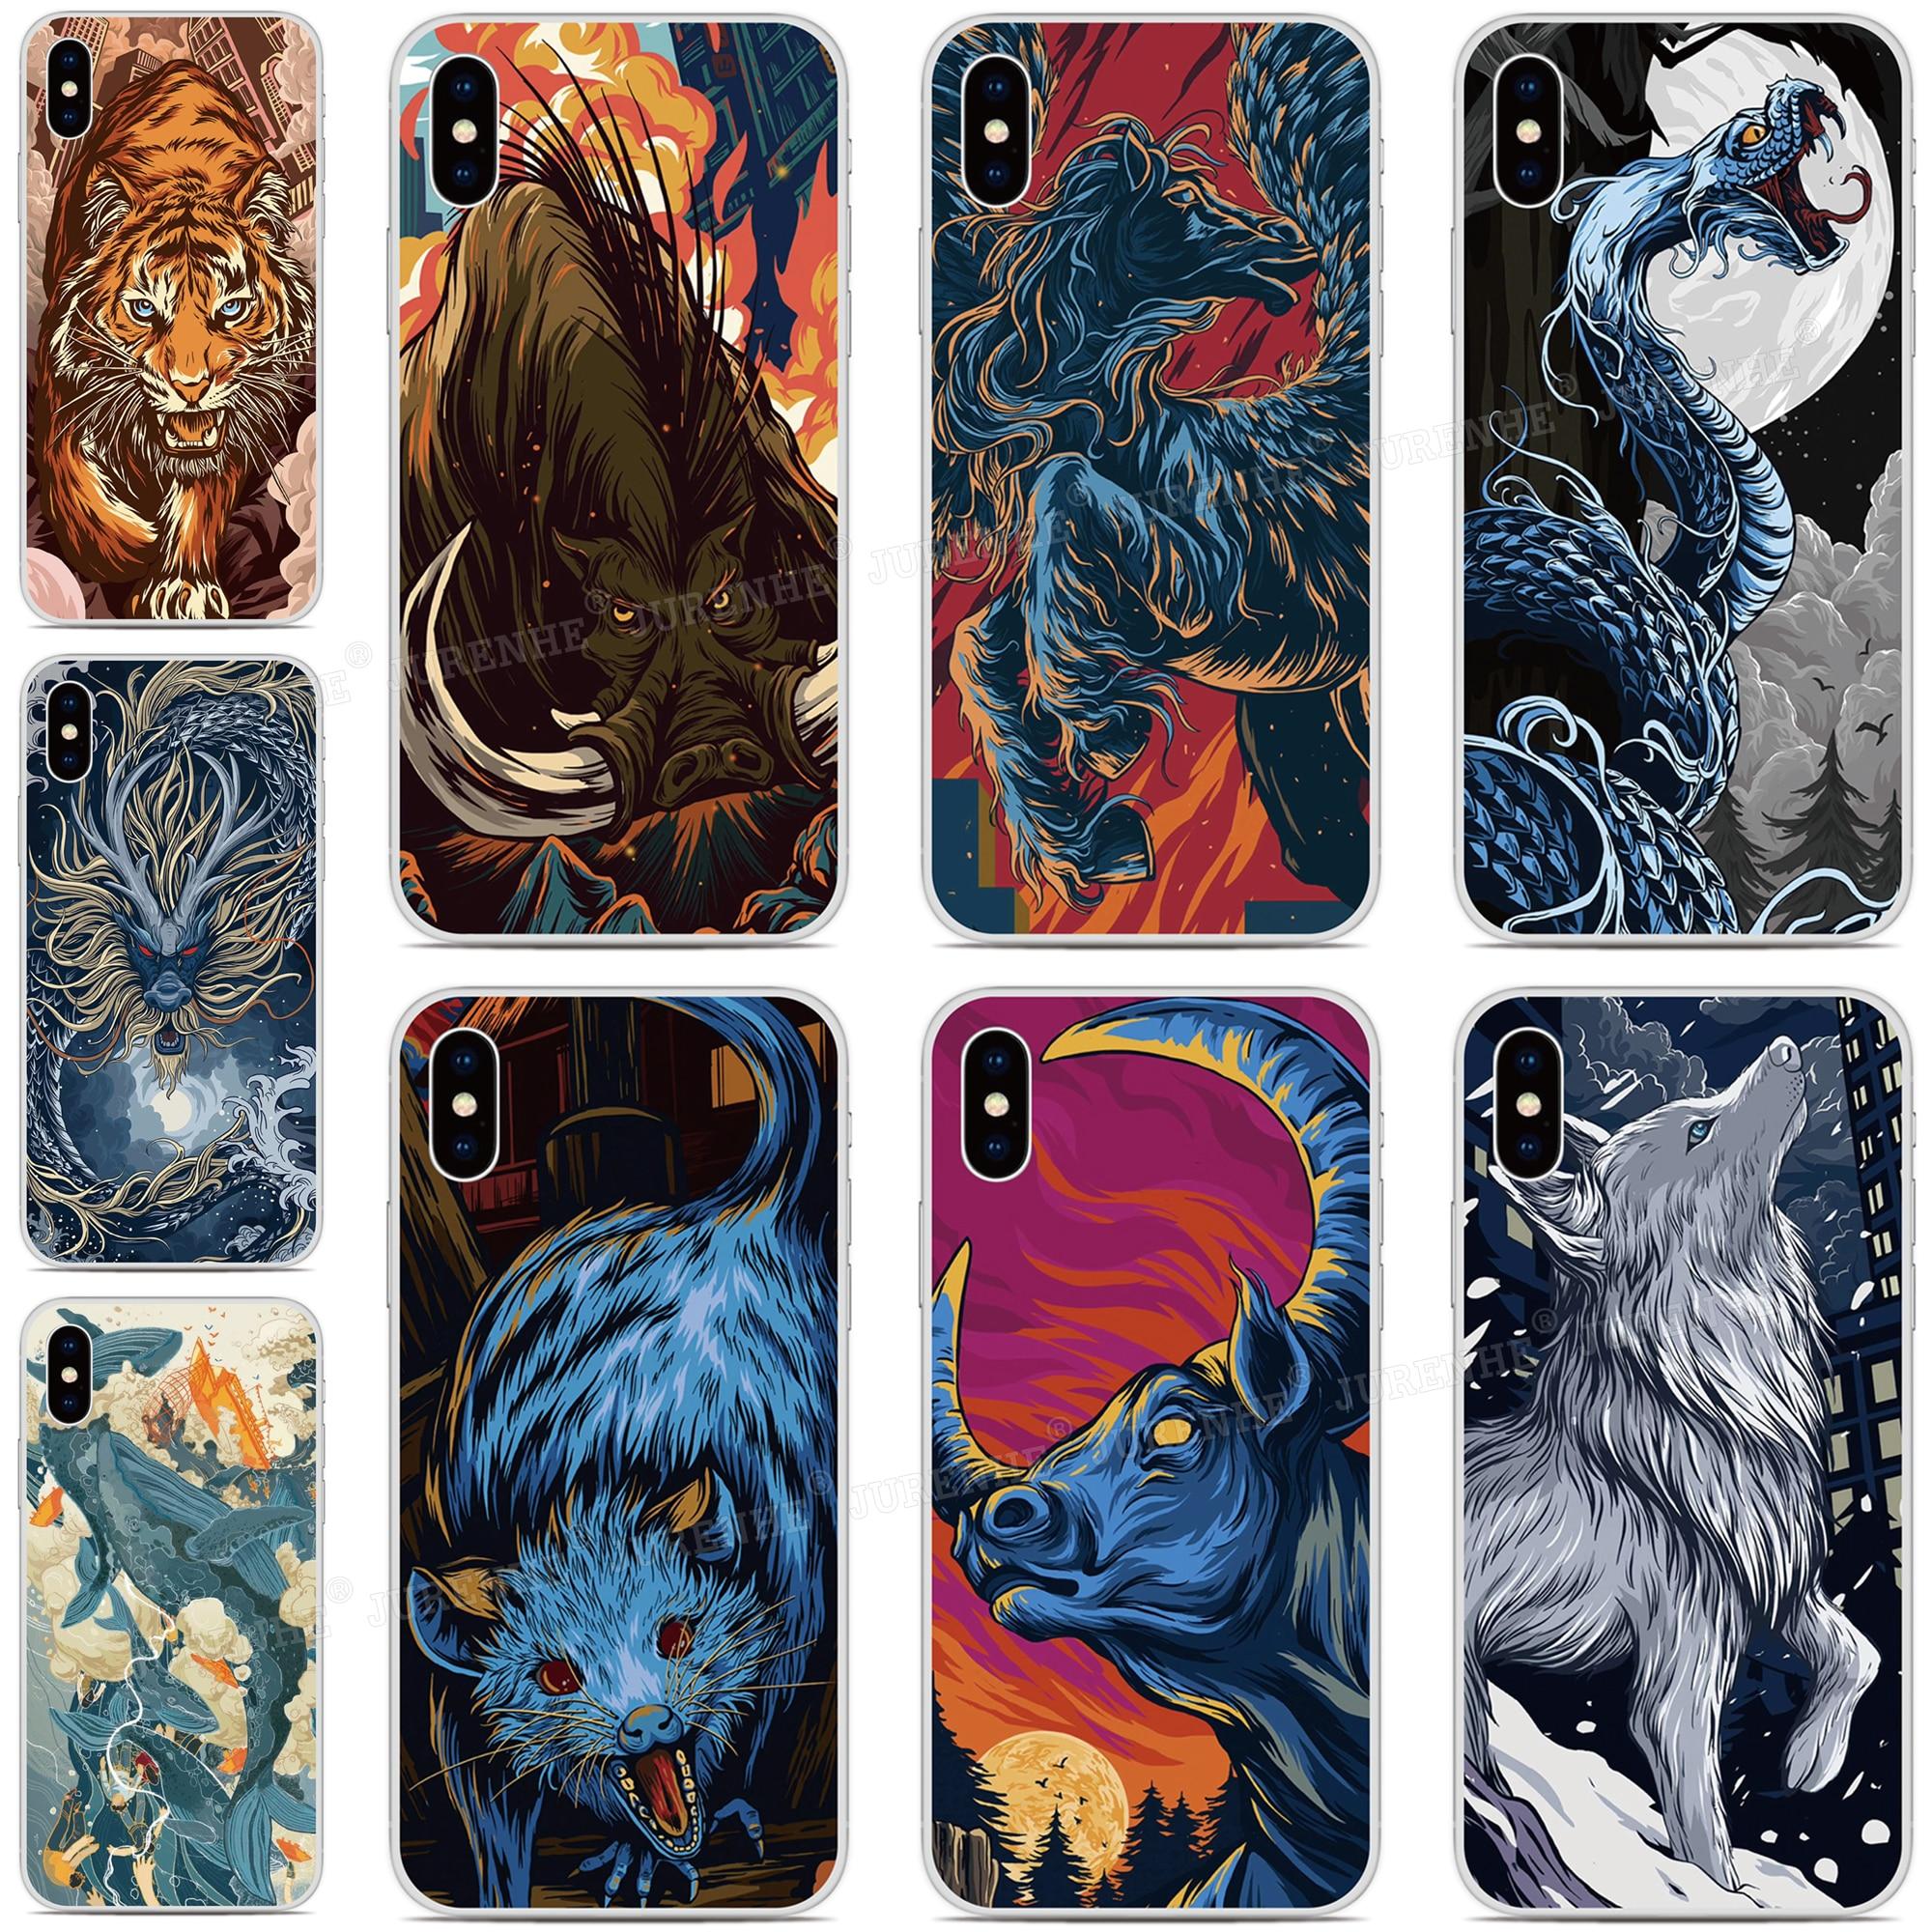 TPU souple 12 Zodiac Motif Animal coque de téléphone Pour Doogee N20 Y9 Plus N10 Y7 Y8 Y8C X70 X60 X60L X50 X50L X30 X55 Housse En Silicone